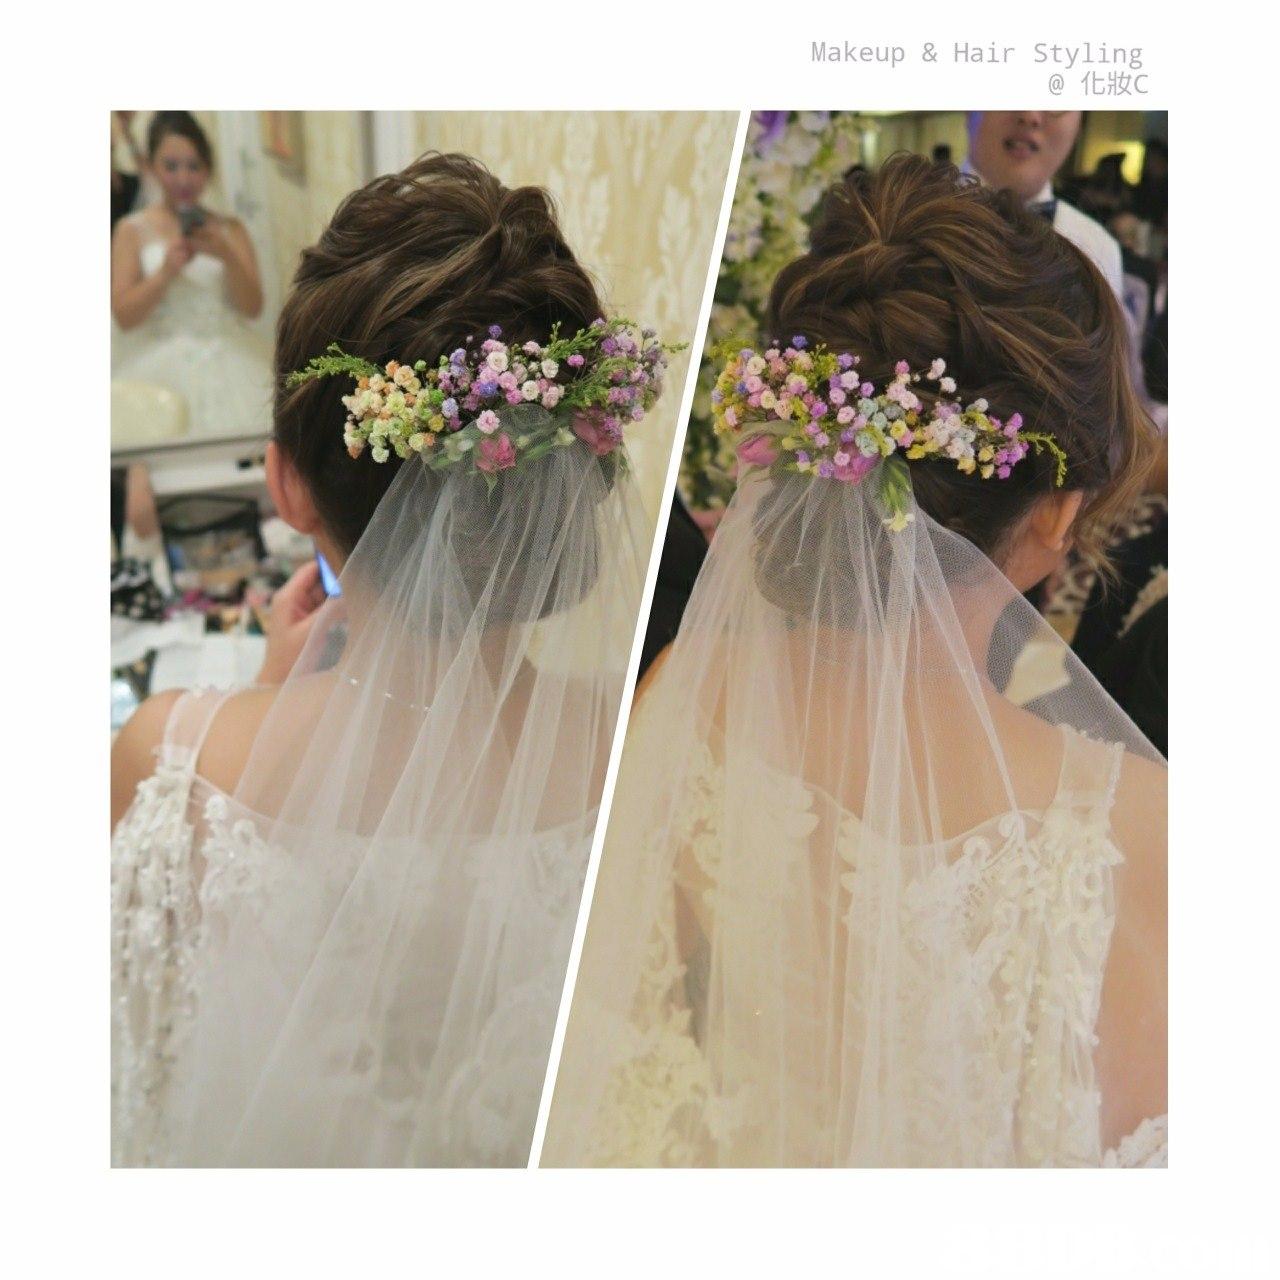 Makeup & Hair Styling @化妝c,flower,gown,flower arranging,bride,flower bouquet